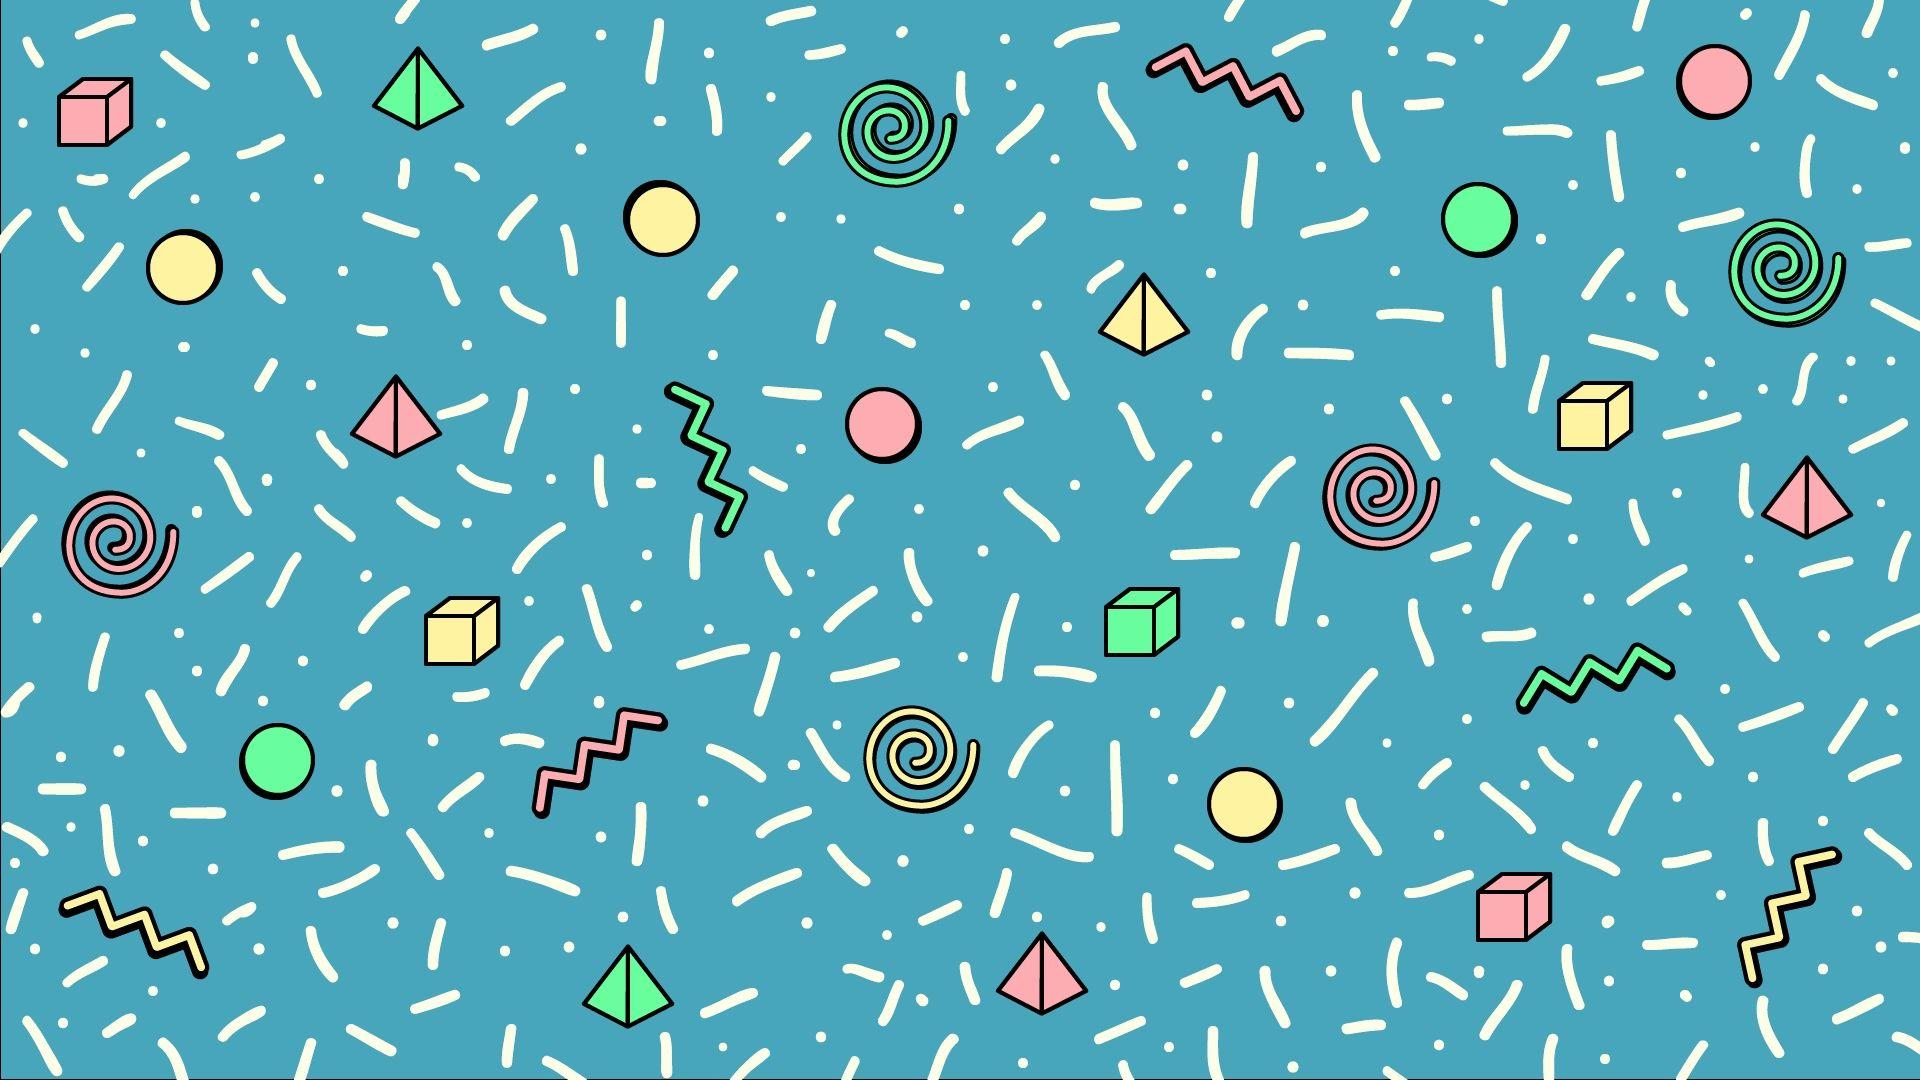 Desktop Retro Aesthetic Wallpapers Wallpaper Cave